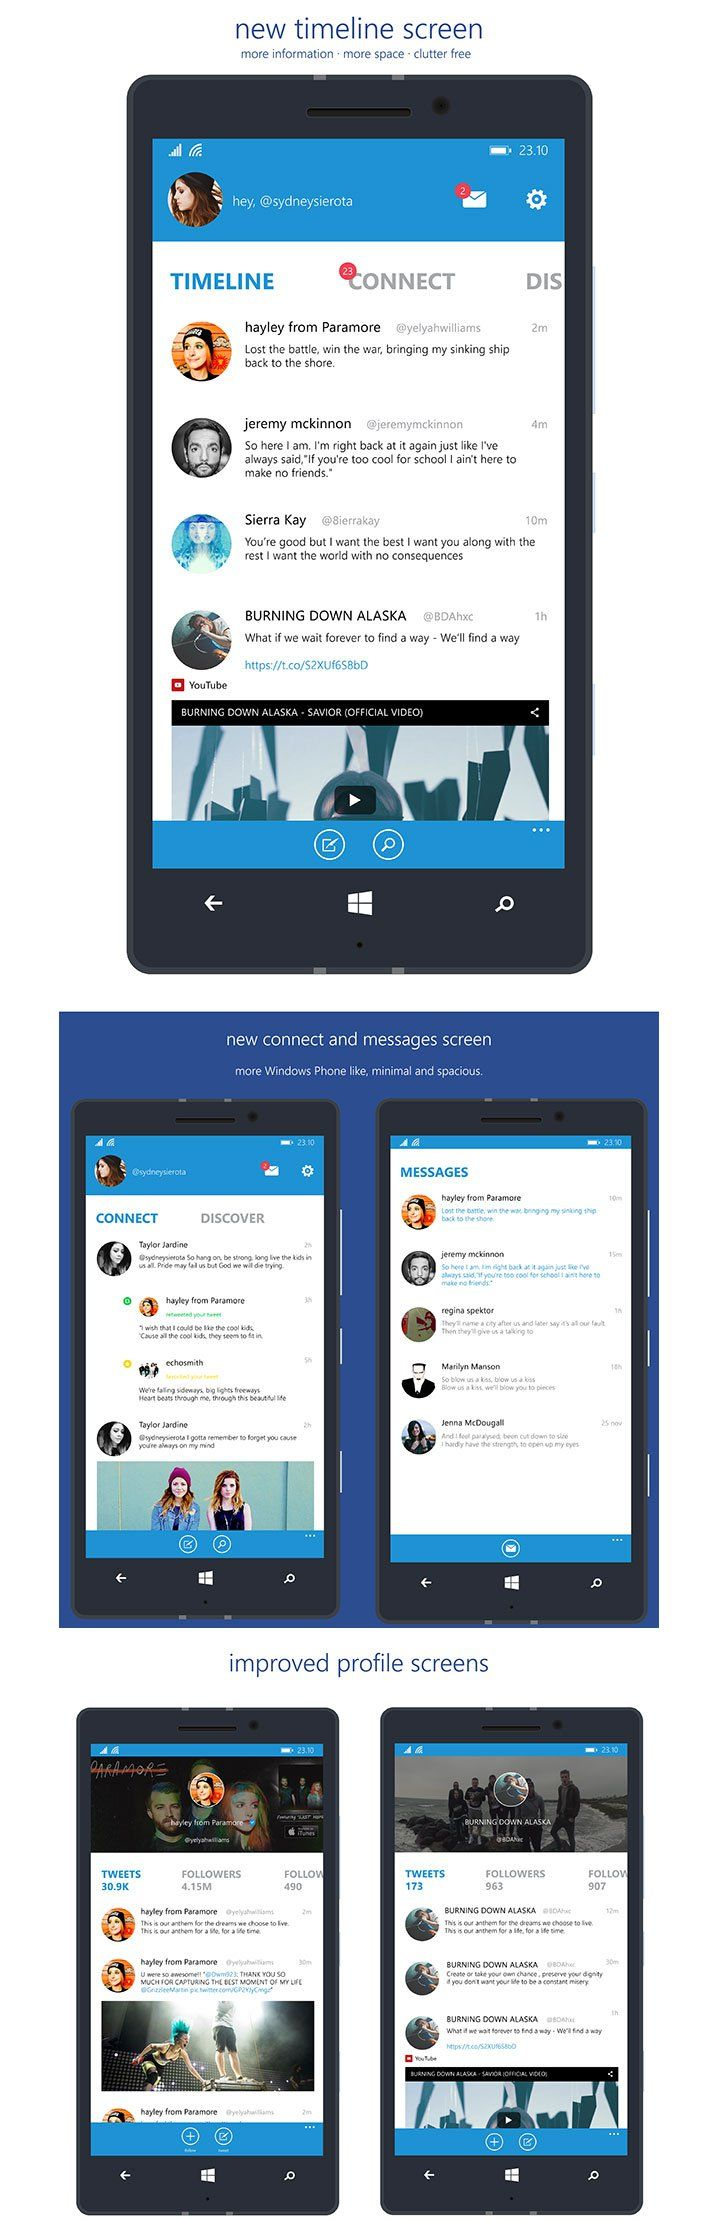 twitter for Windows Phone app smartphone